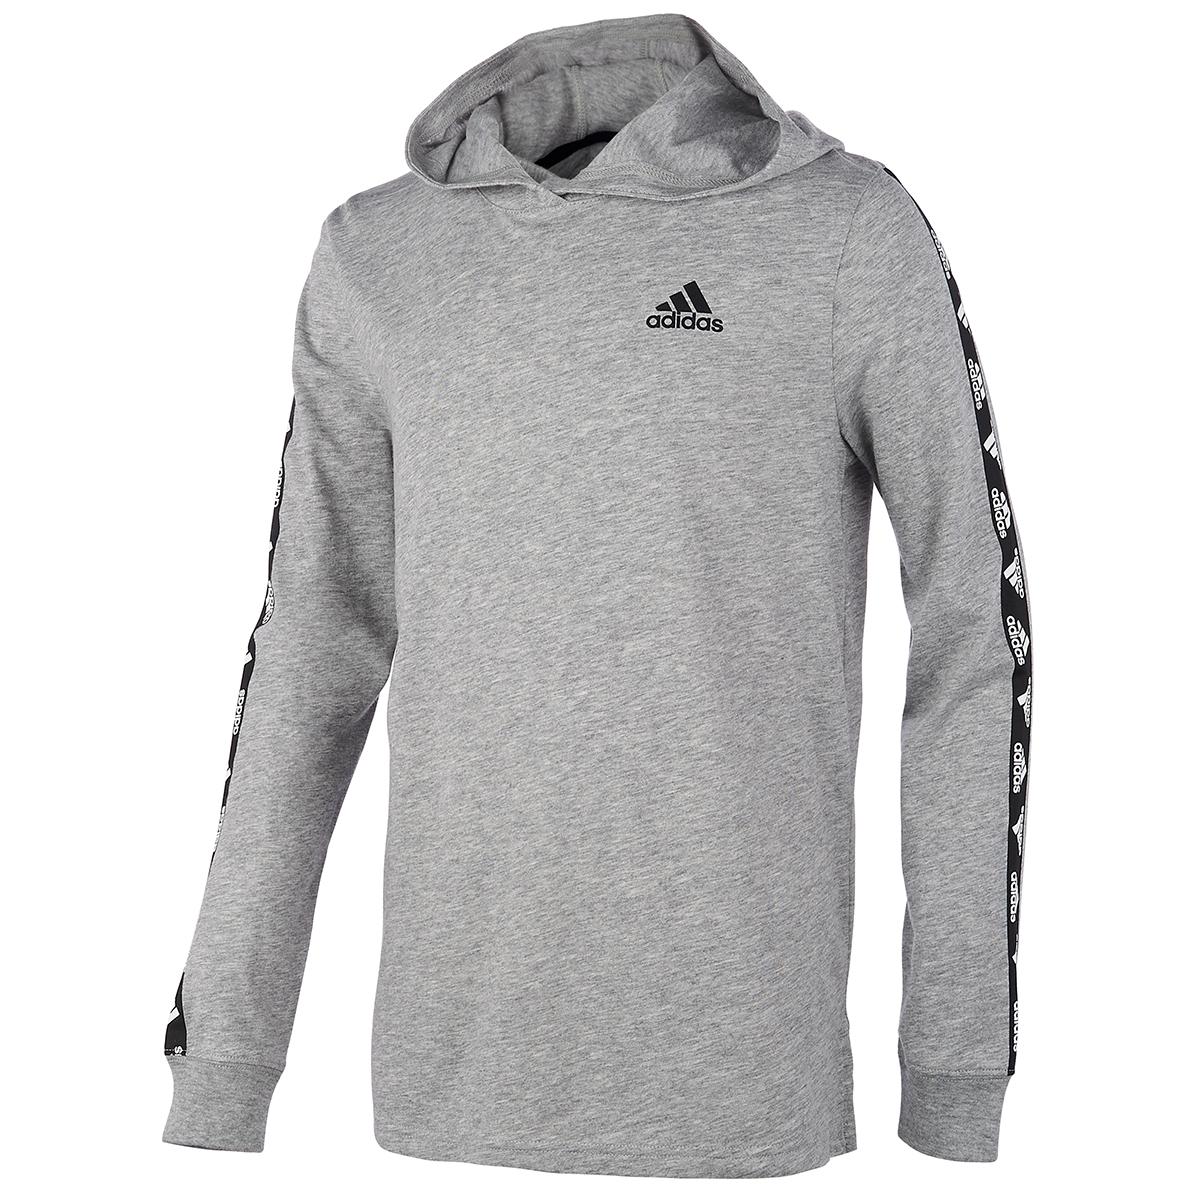 Adidas Boys' Badge Of Sport Hooded Long-Sleeve Tee - Black, XL